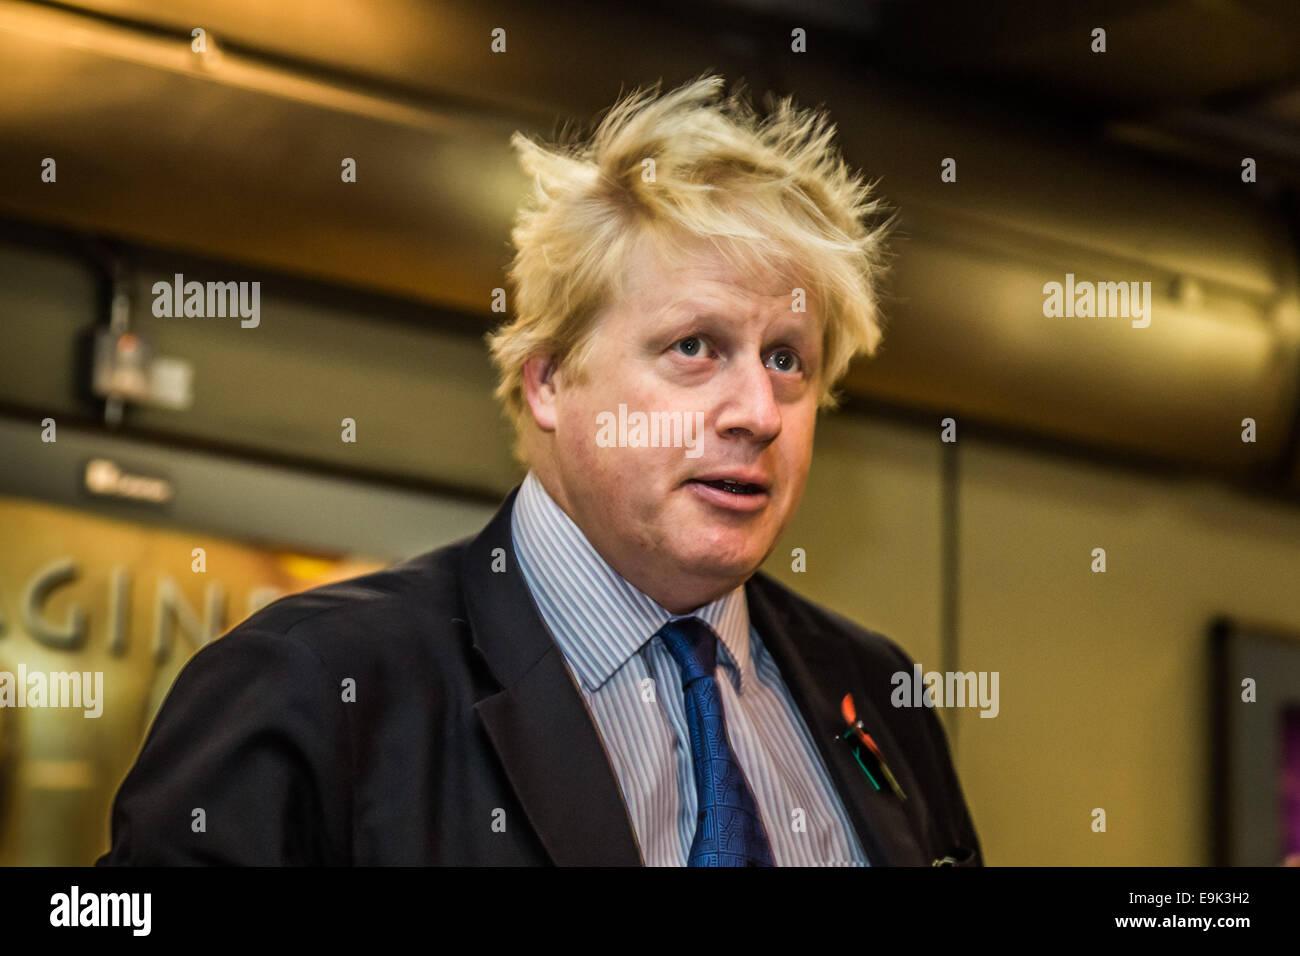 London, UK. 29th Oct, 2014. Mayor Boris Johnson at London Bridge Station Credit:  Guy Corbishley/Alamy Live News - Stock Image